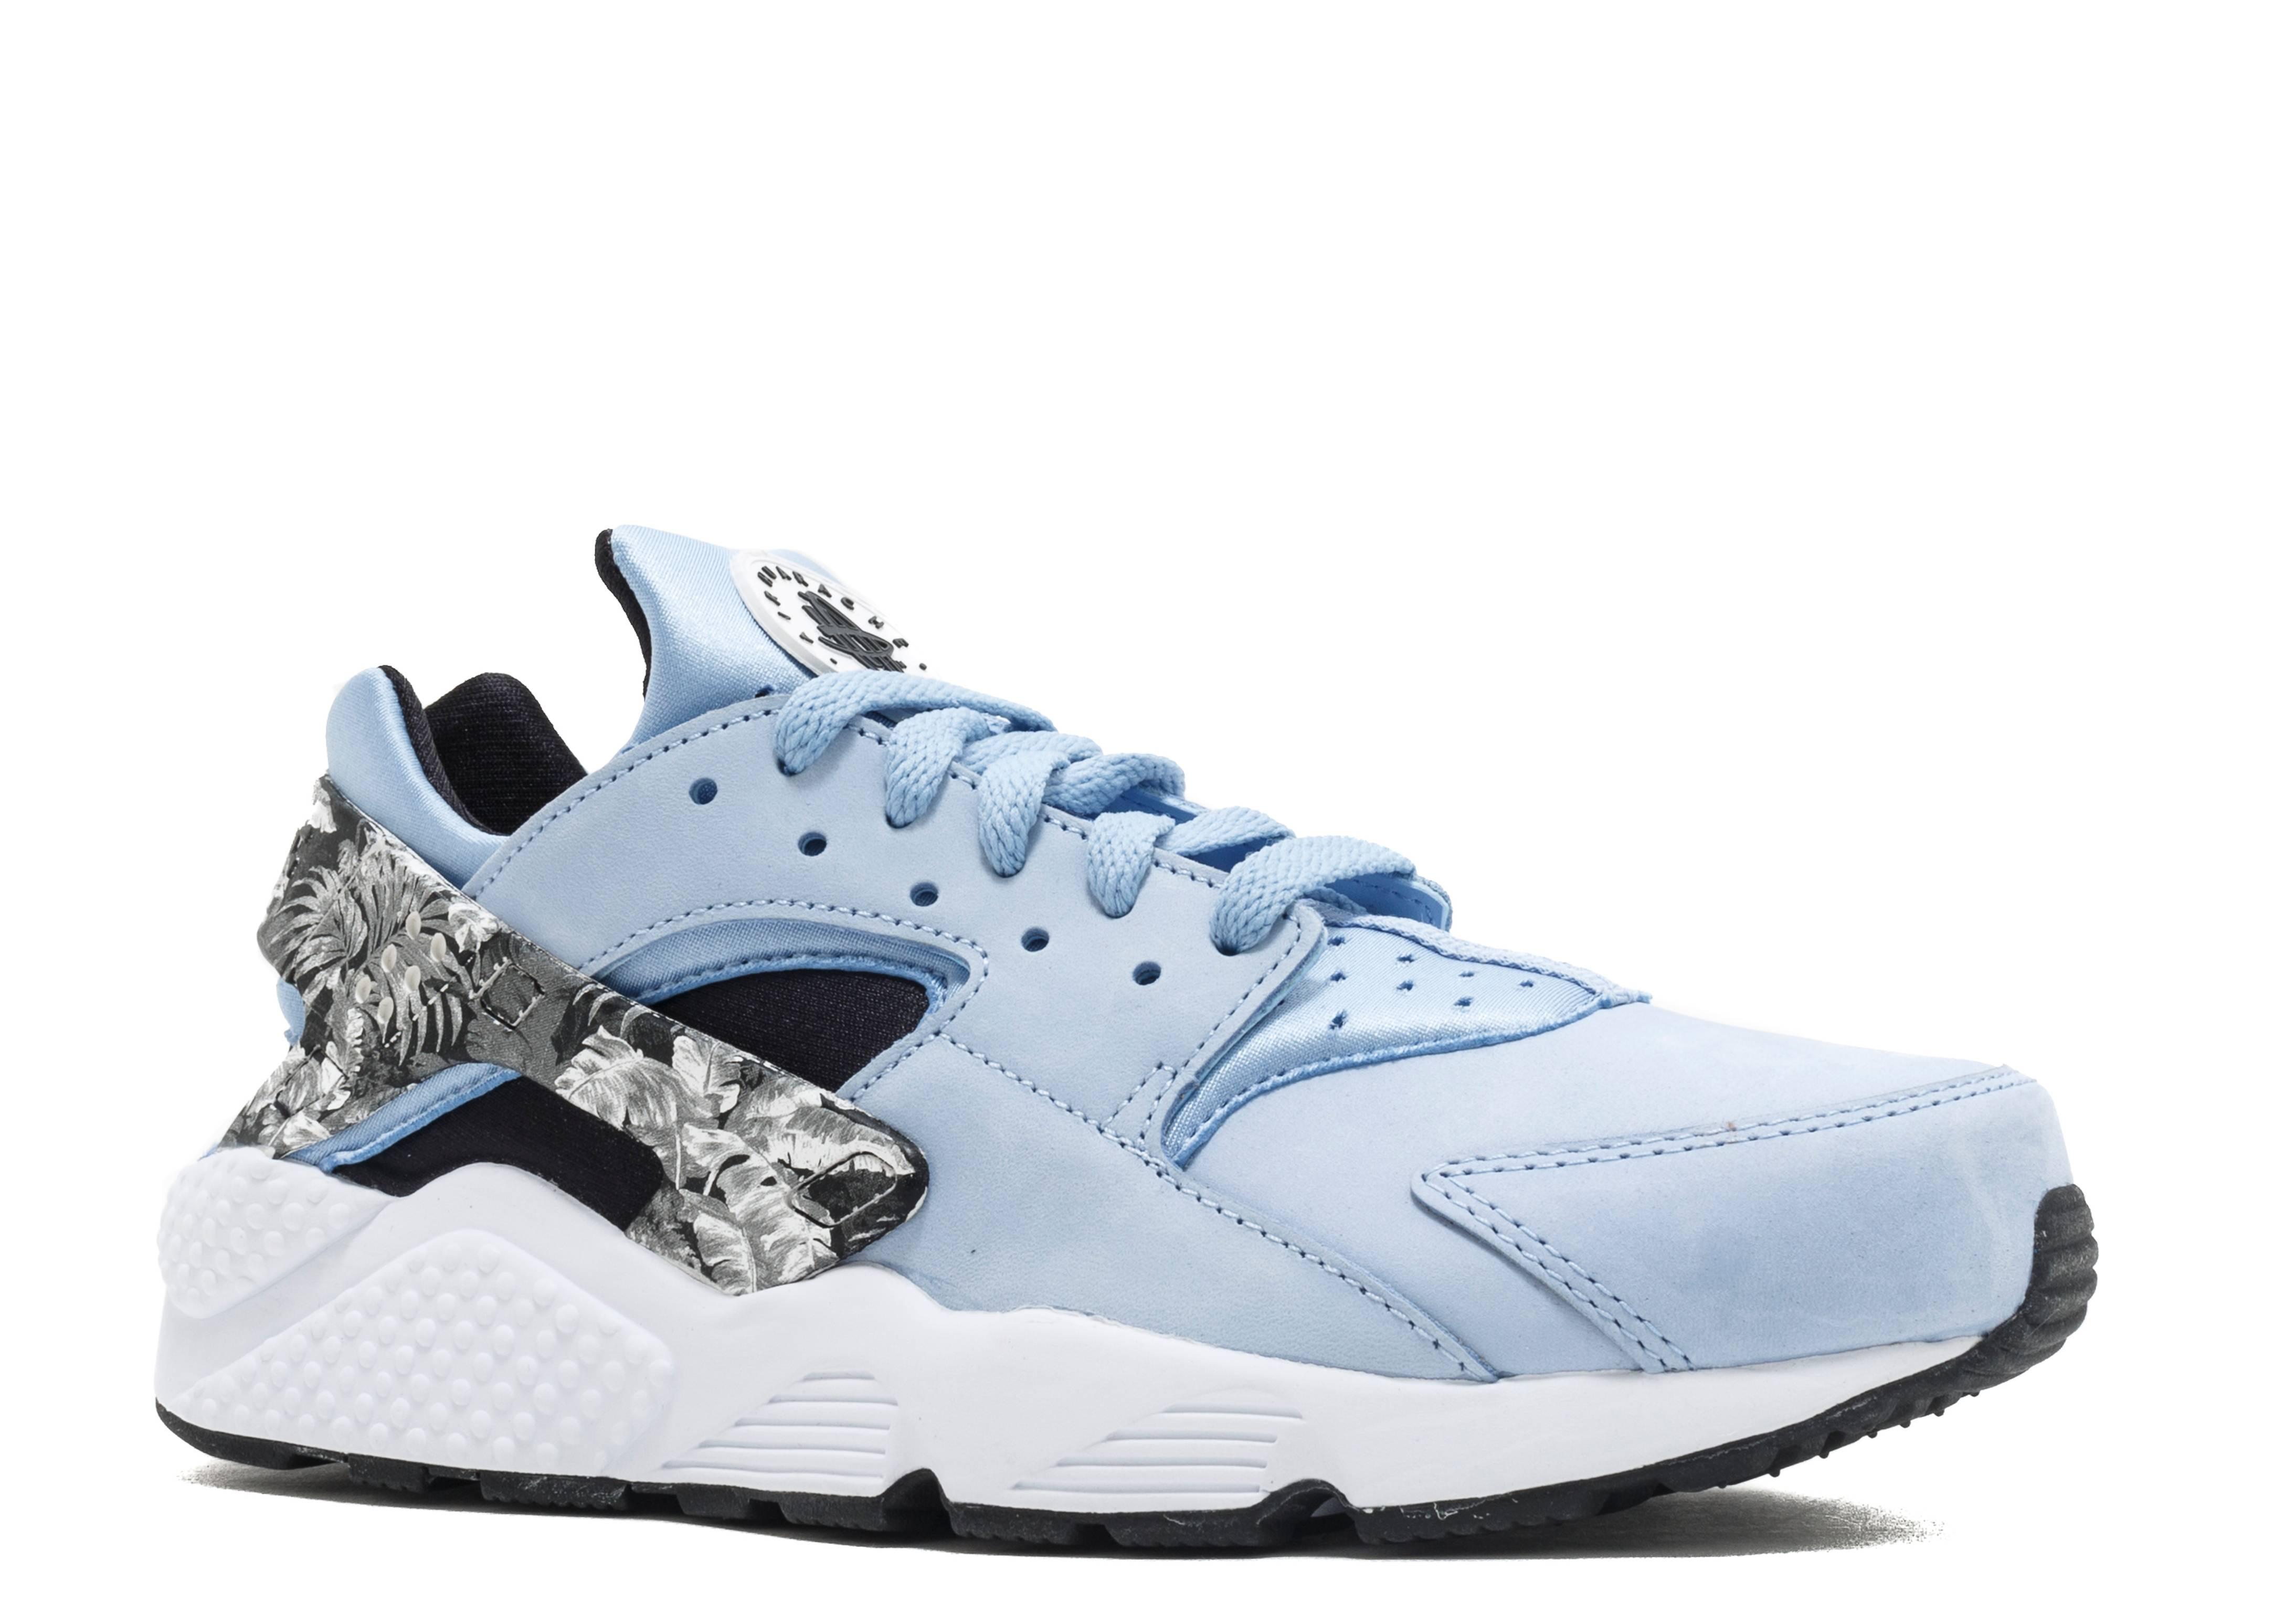 Air Huarache Premium 'Aluminum' - Nike - 704830 401 - aluminum ...